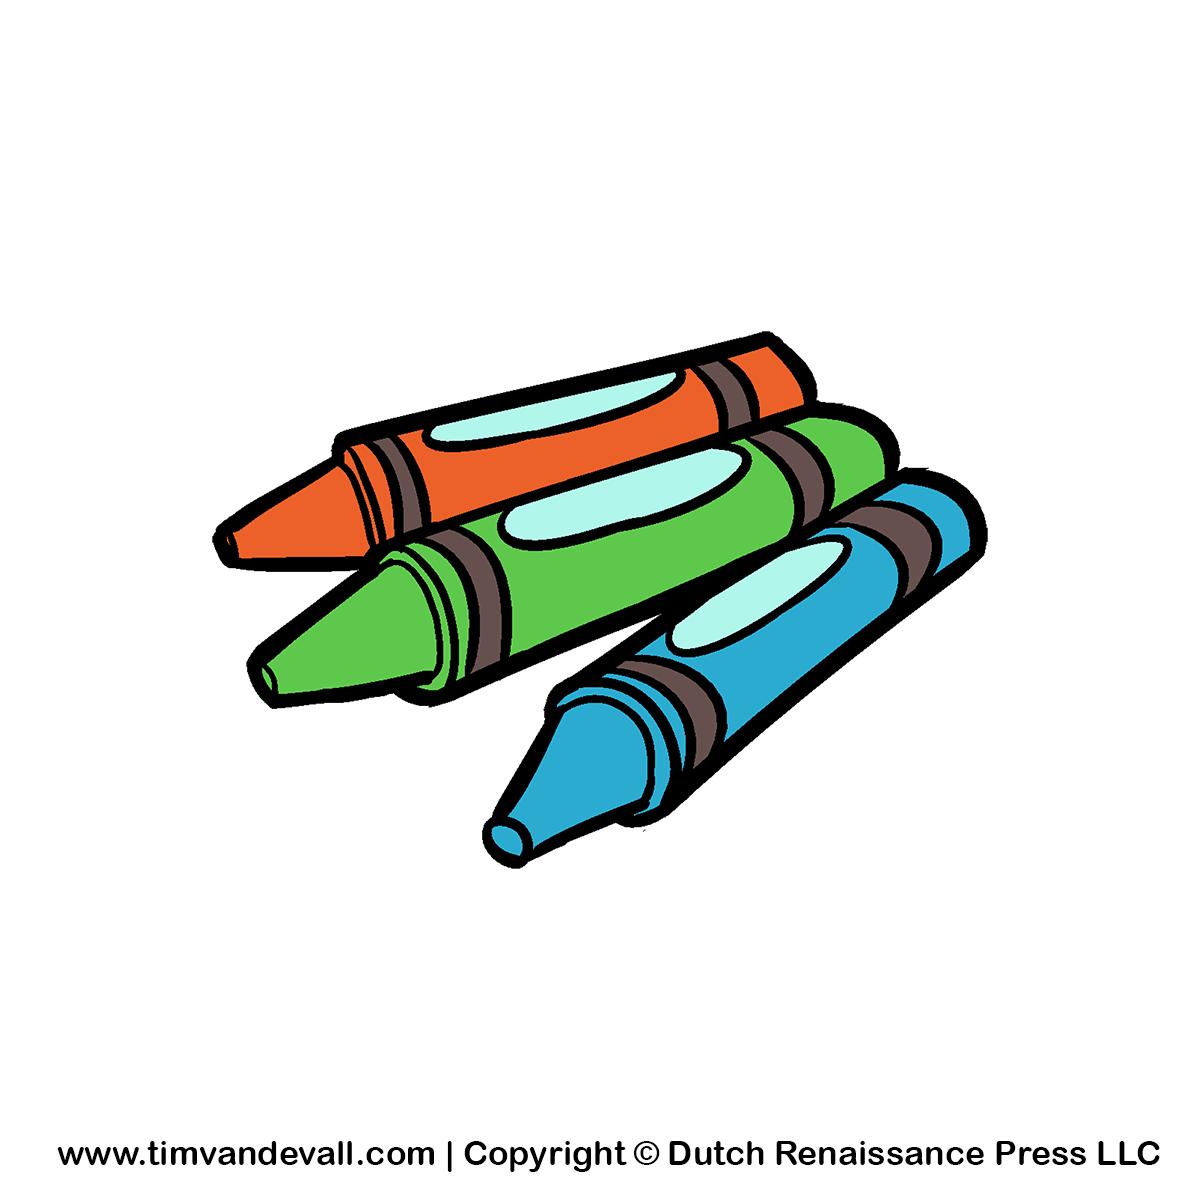 1200x1200 Crayola Crayon Clipart